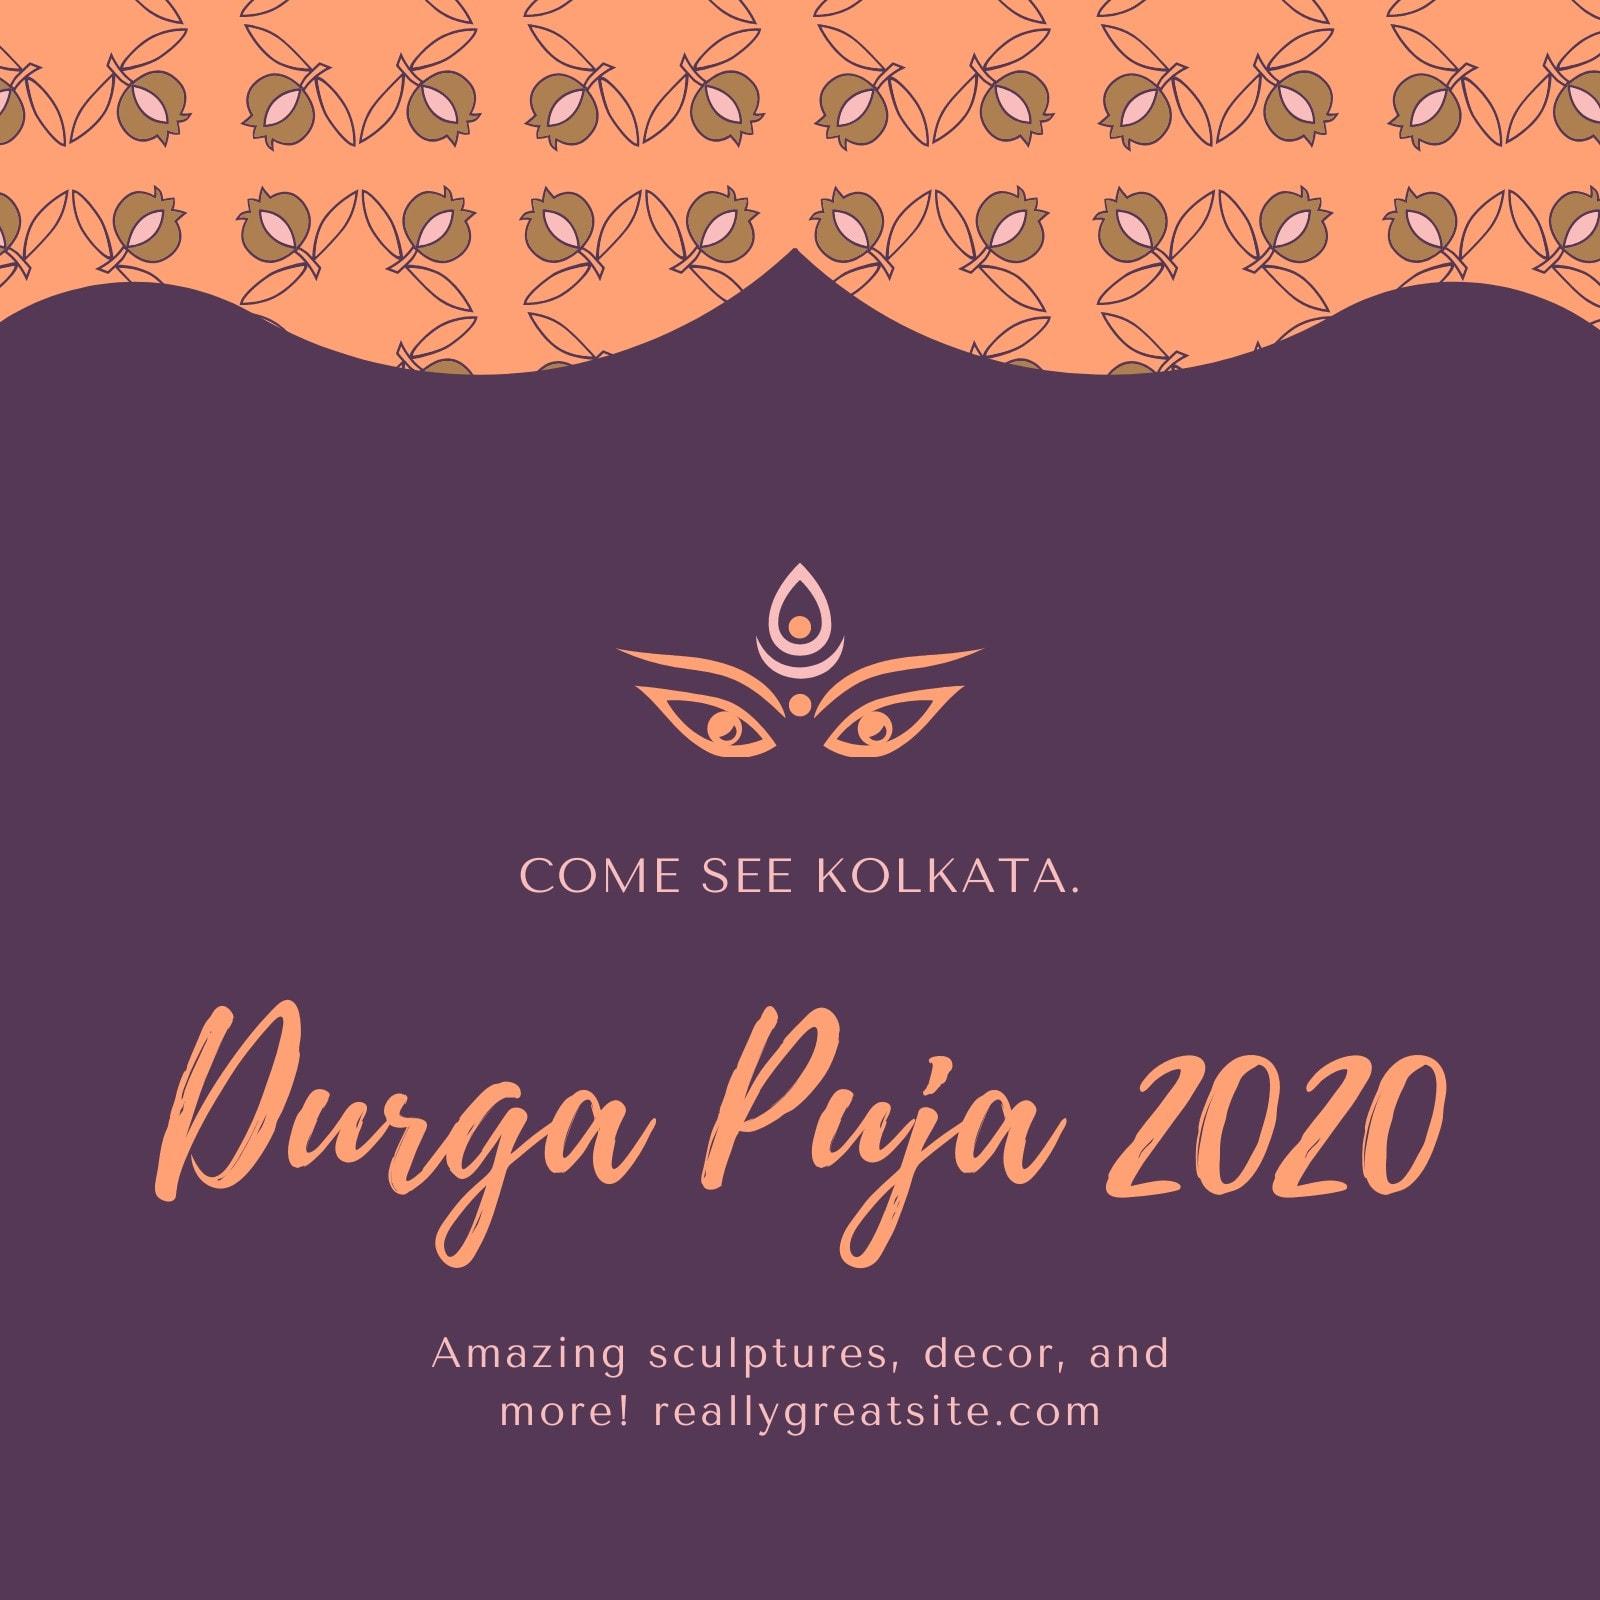 Purple and Cream Durja Puja Social Media Graphics